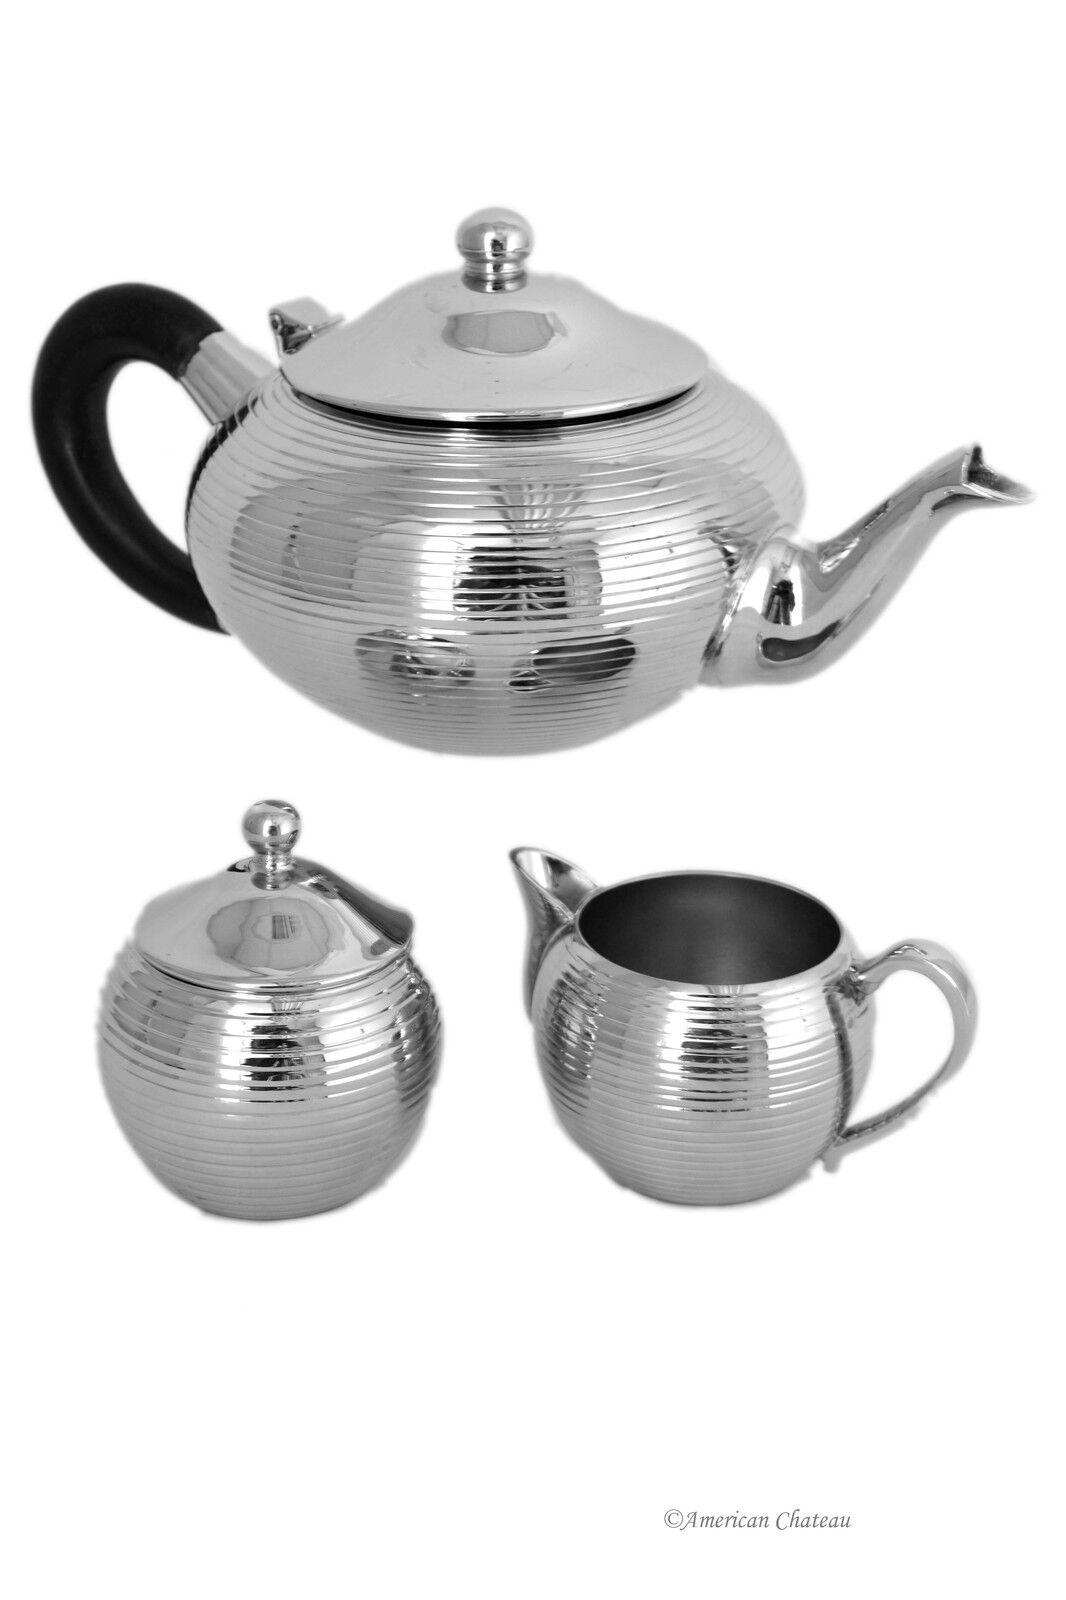 Ribbed Ribbed Ribbed Stainless Steel 28 oz Teapot with Creamer & Sugar Jar Tea Coffee Set cf8df8